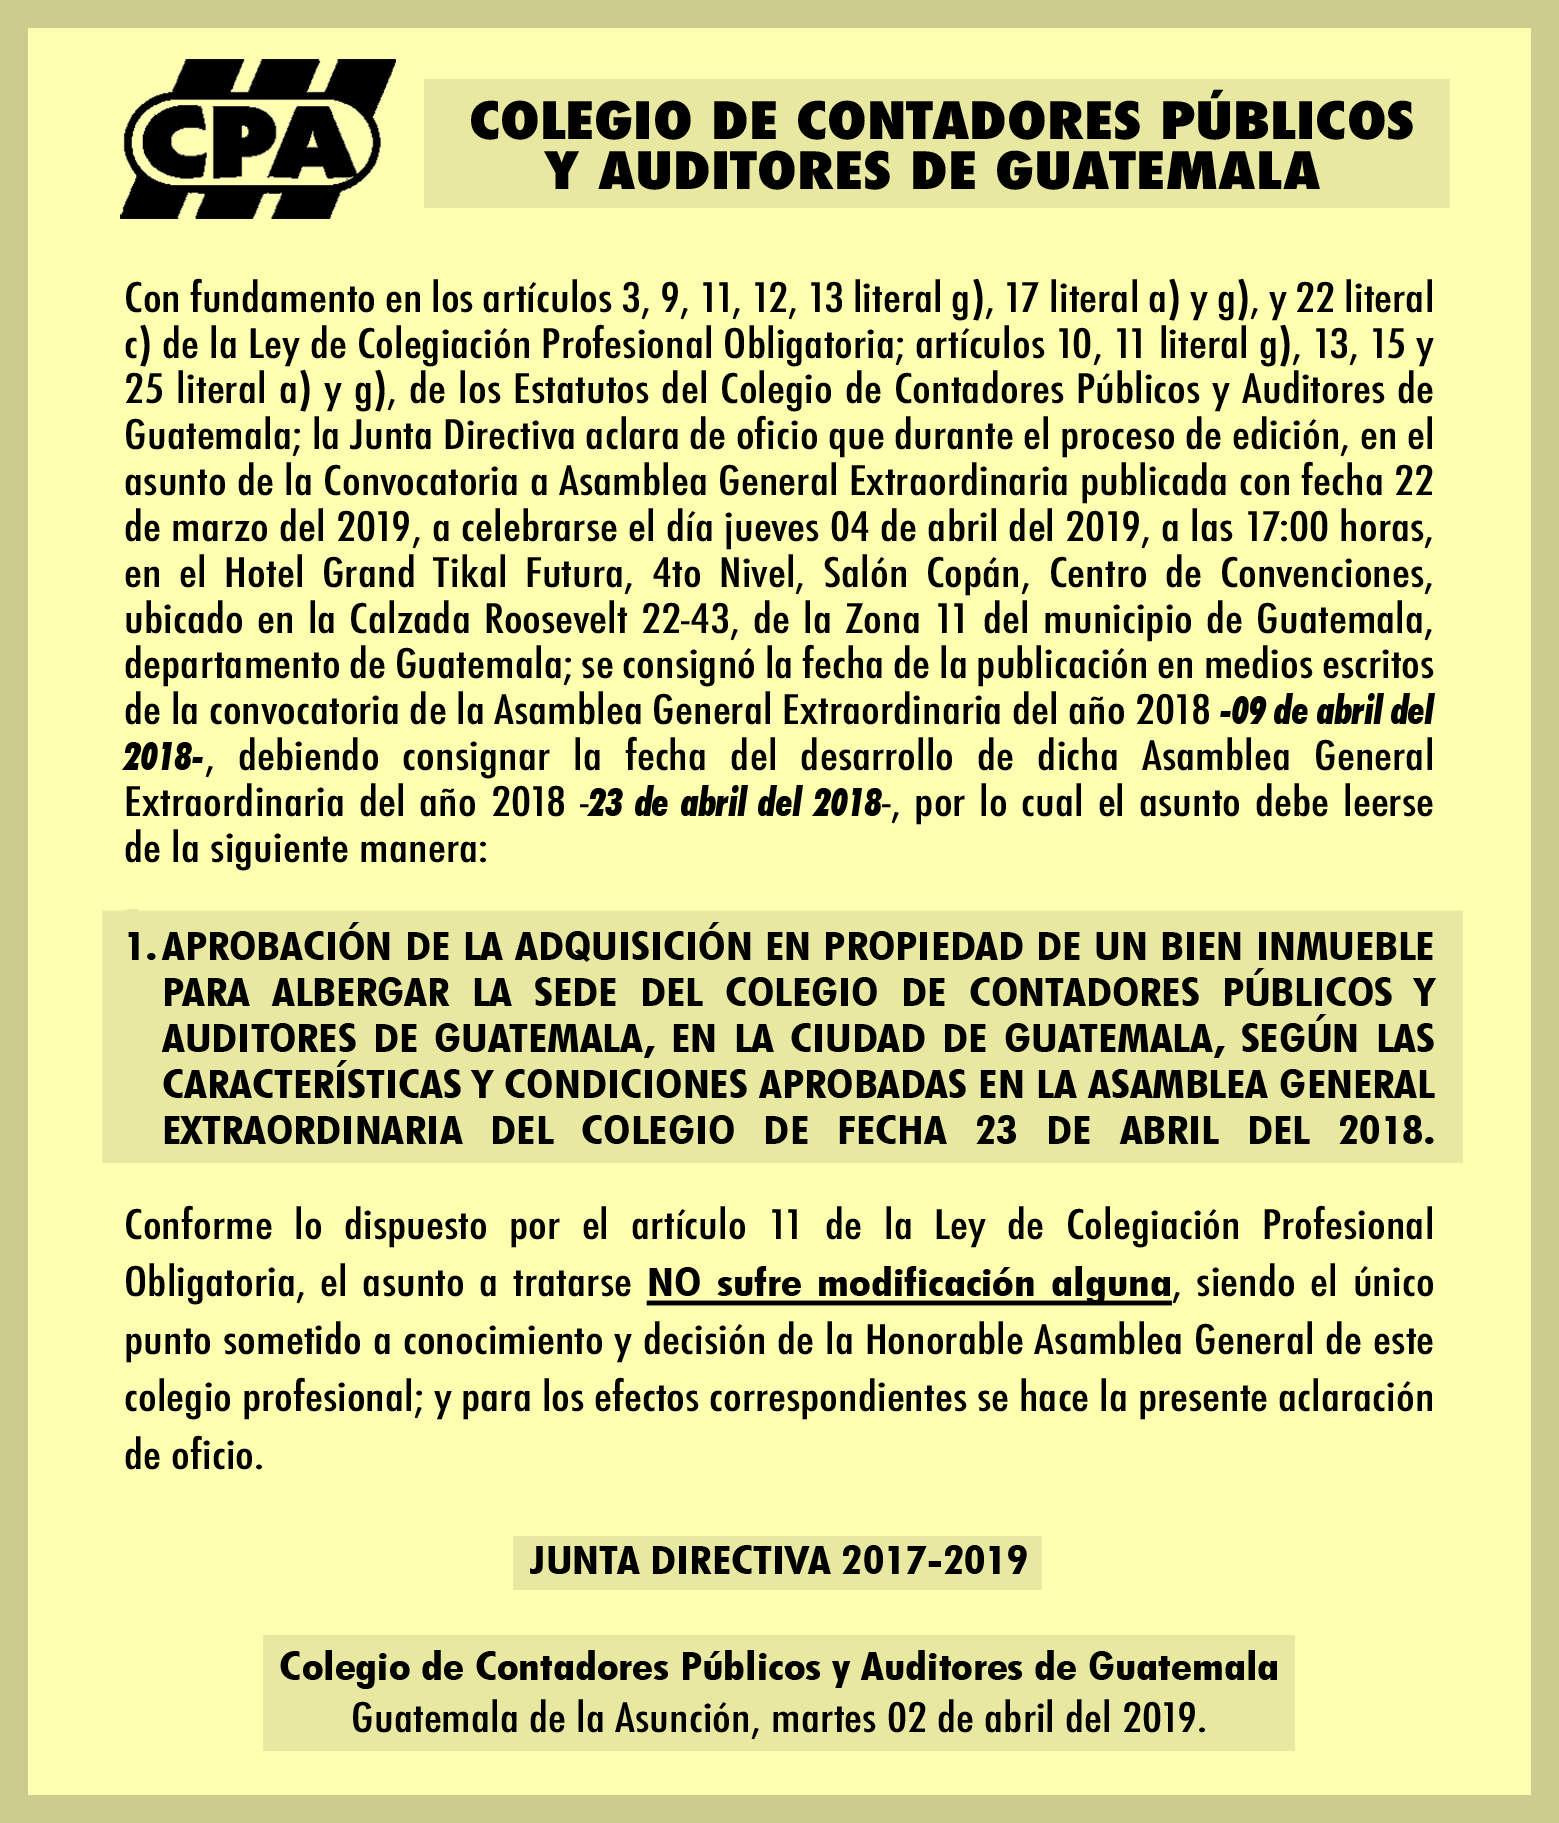 Nota aclaratoria de Asamblea General Extraordinaria a celebrarse el 04 de abril del 2019.